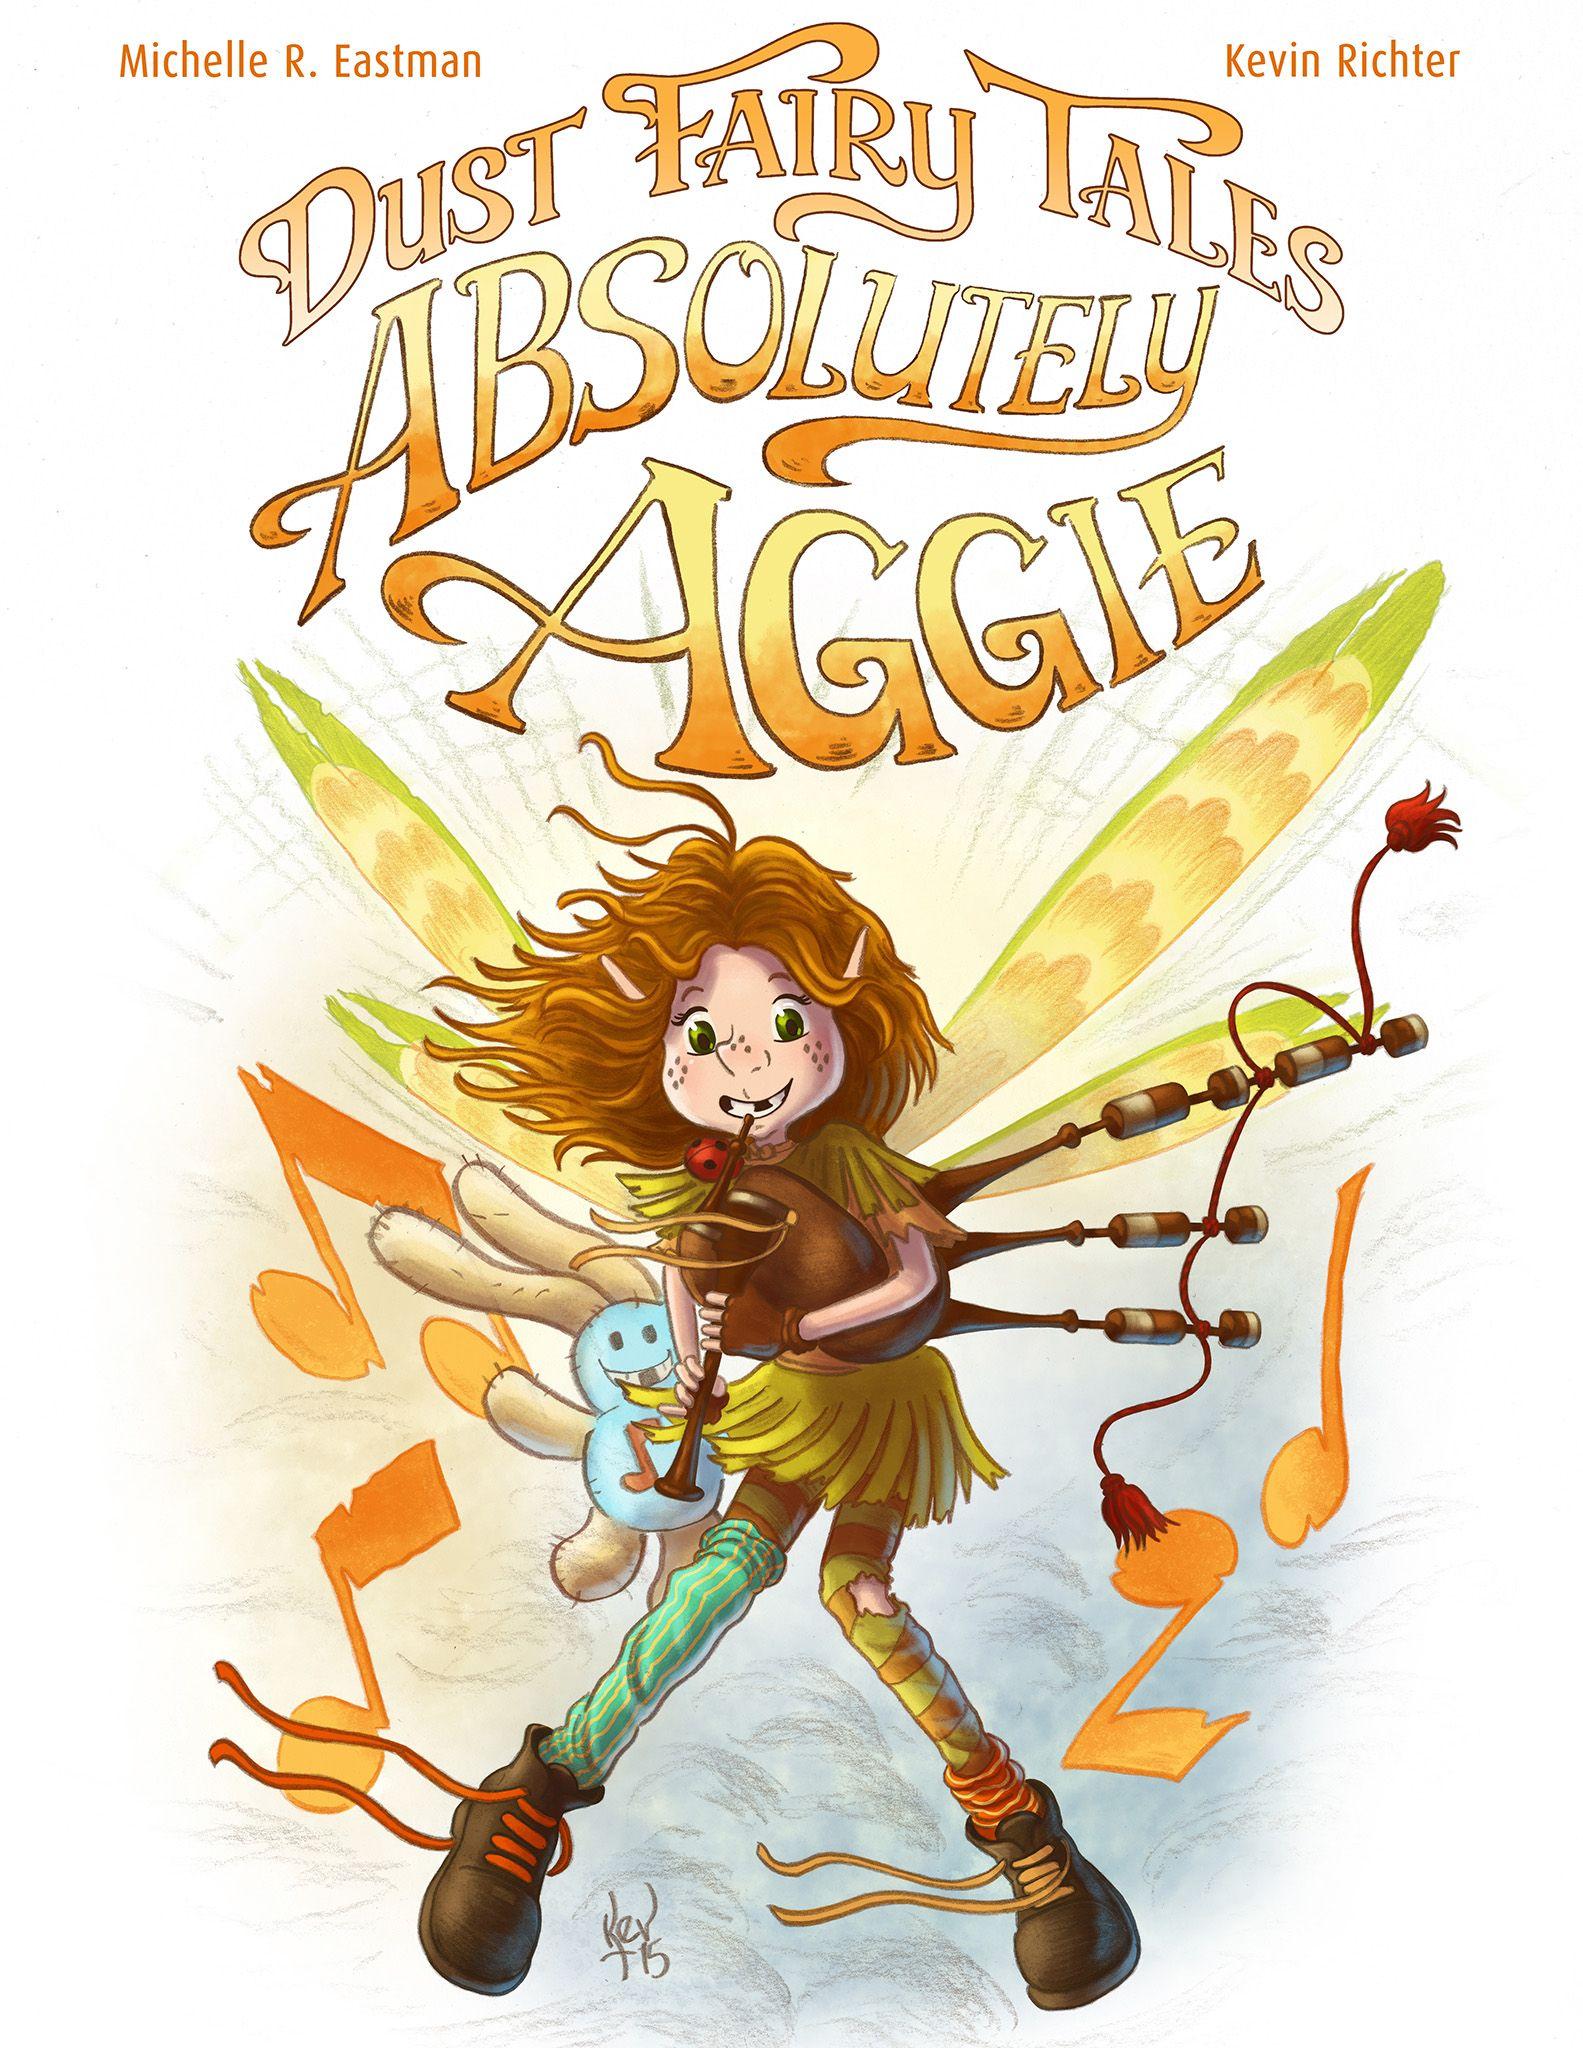 Cover Reveal…Tada Kids story books, Classic childrens